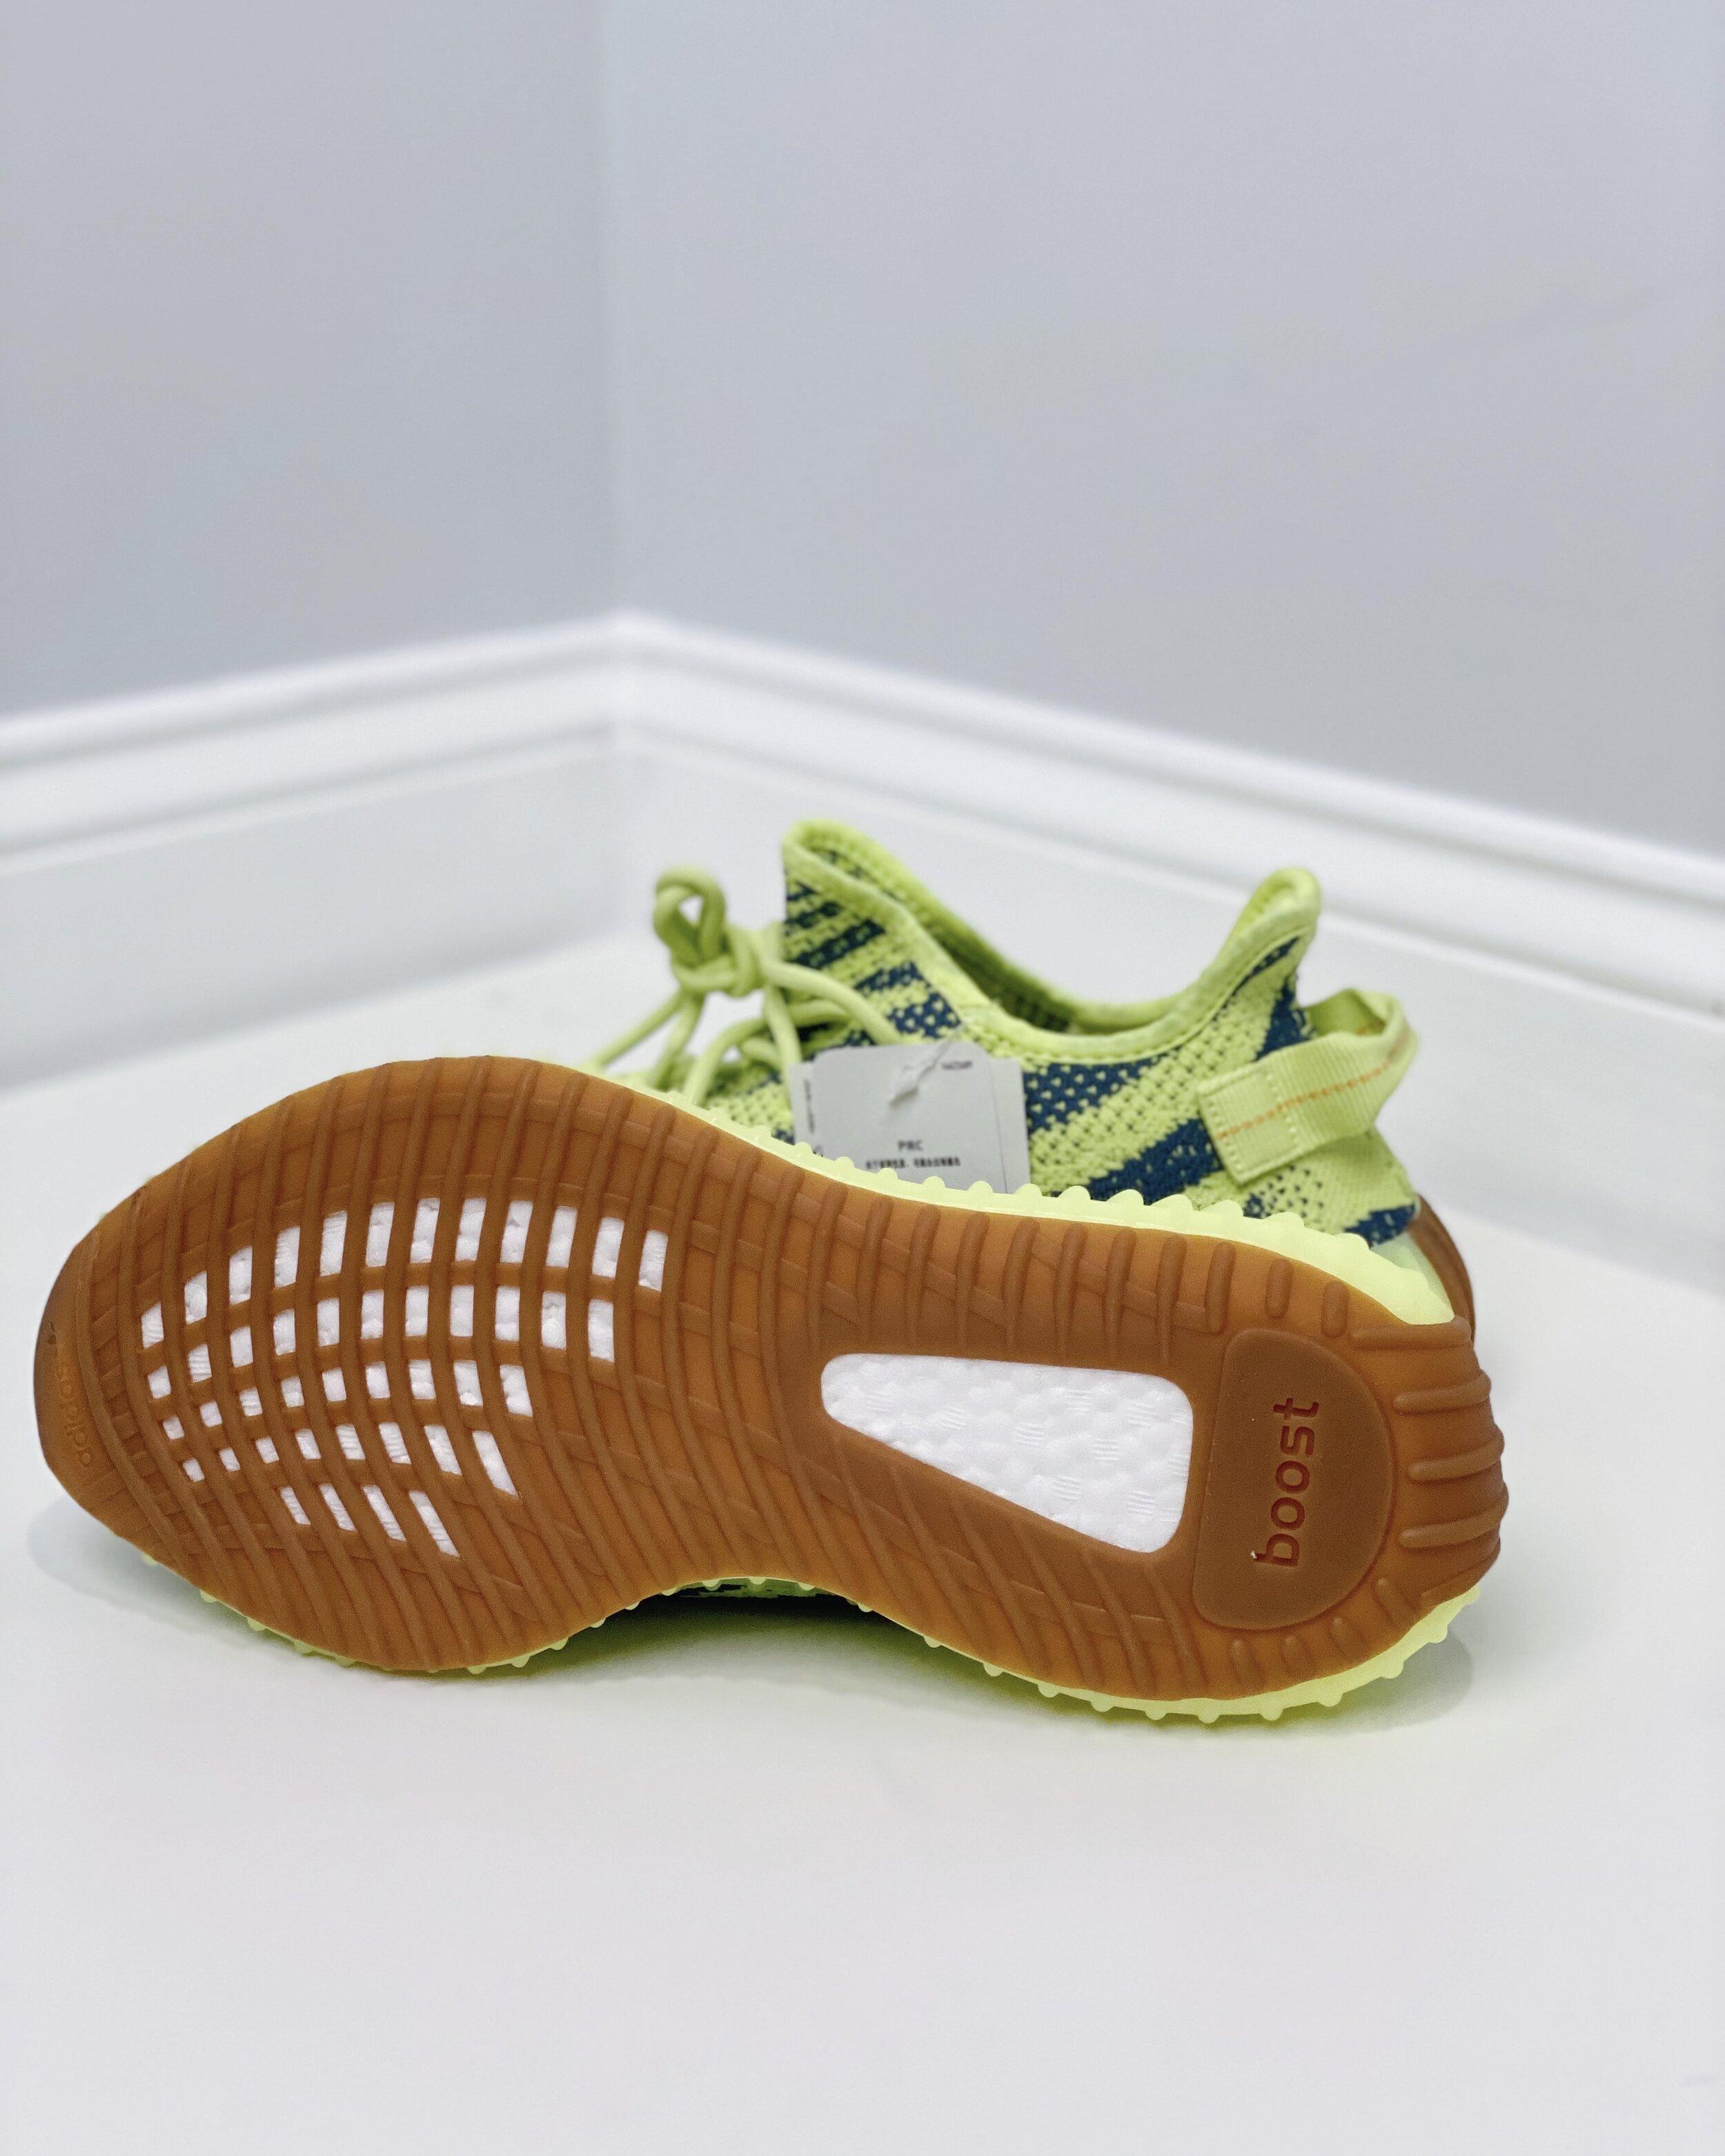 Yeezy Boost 350 V2 Semi Frozen Yellow adidas